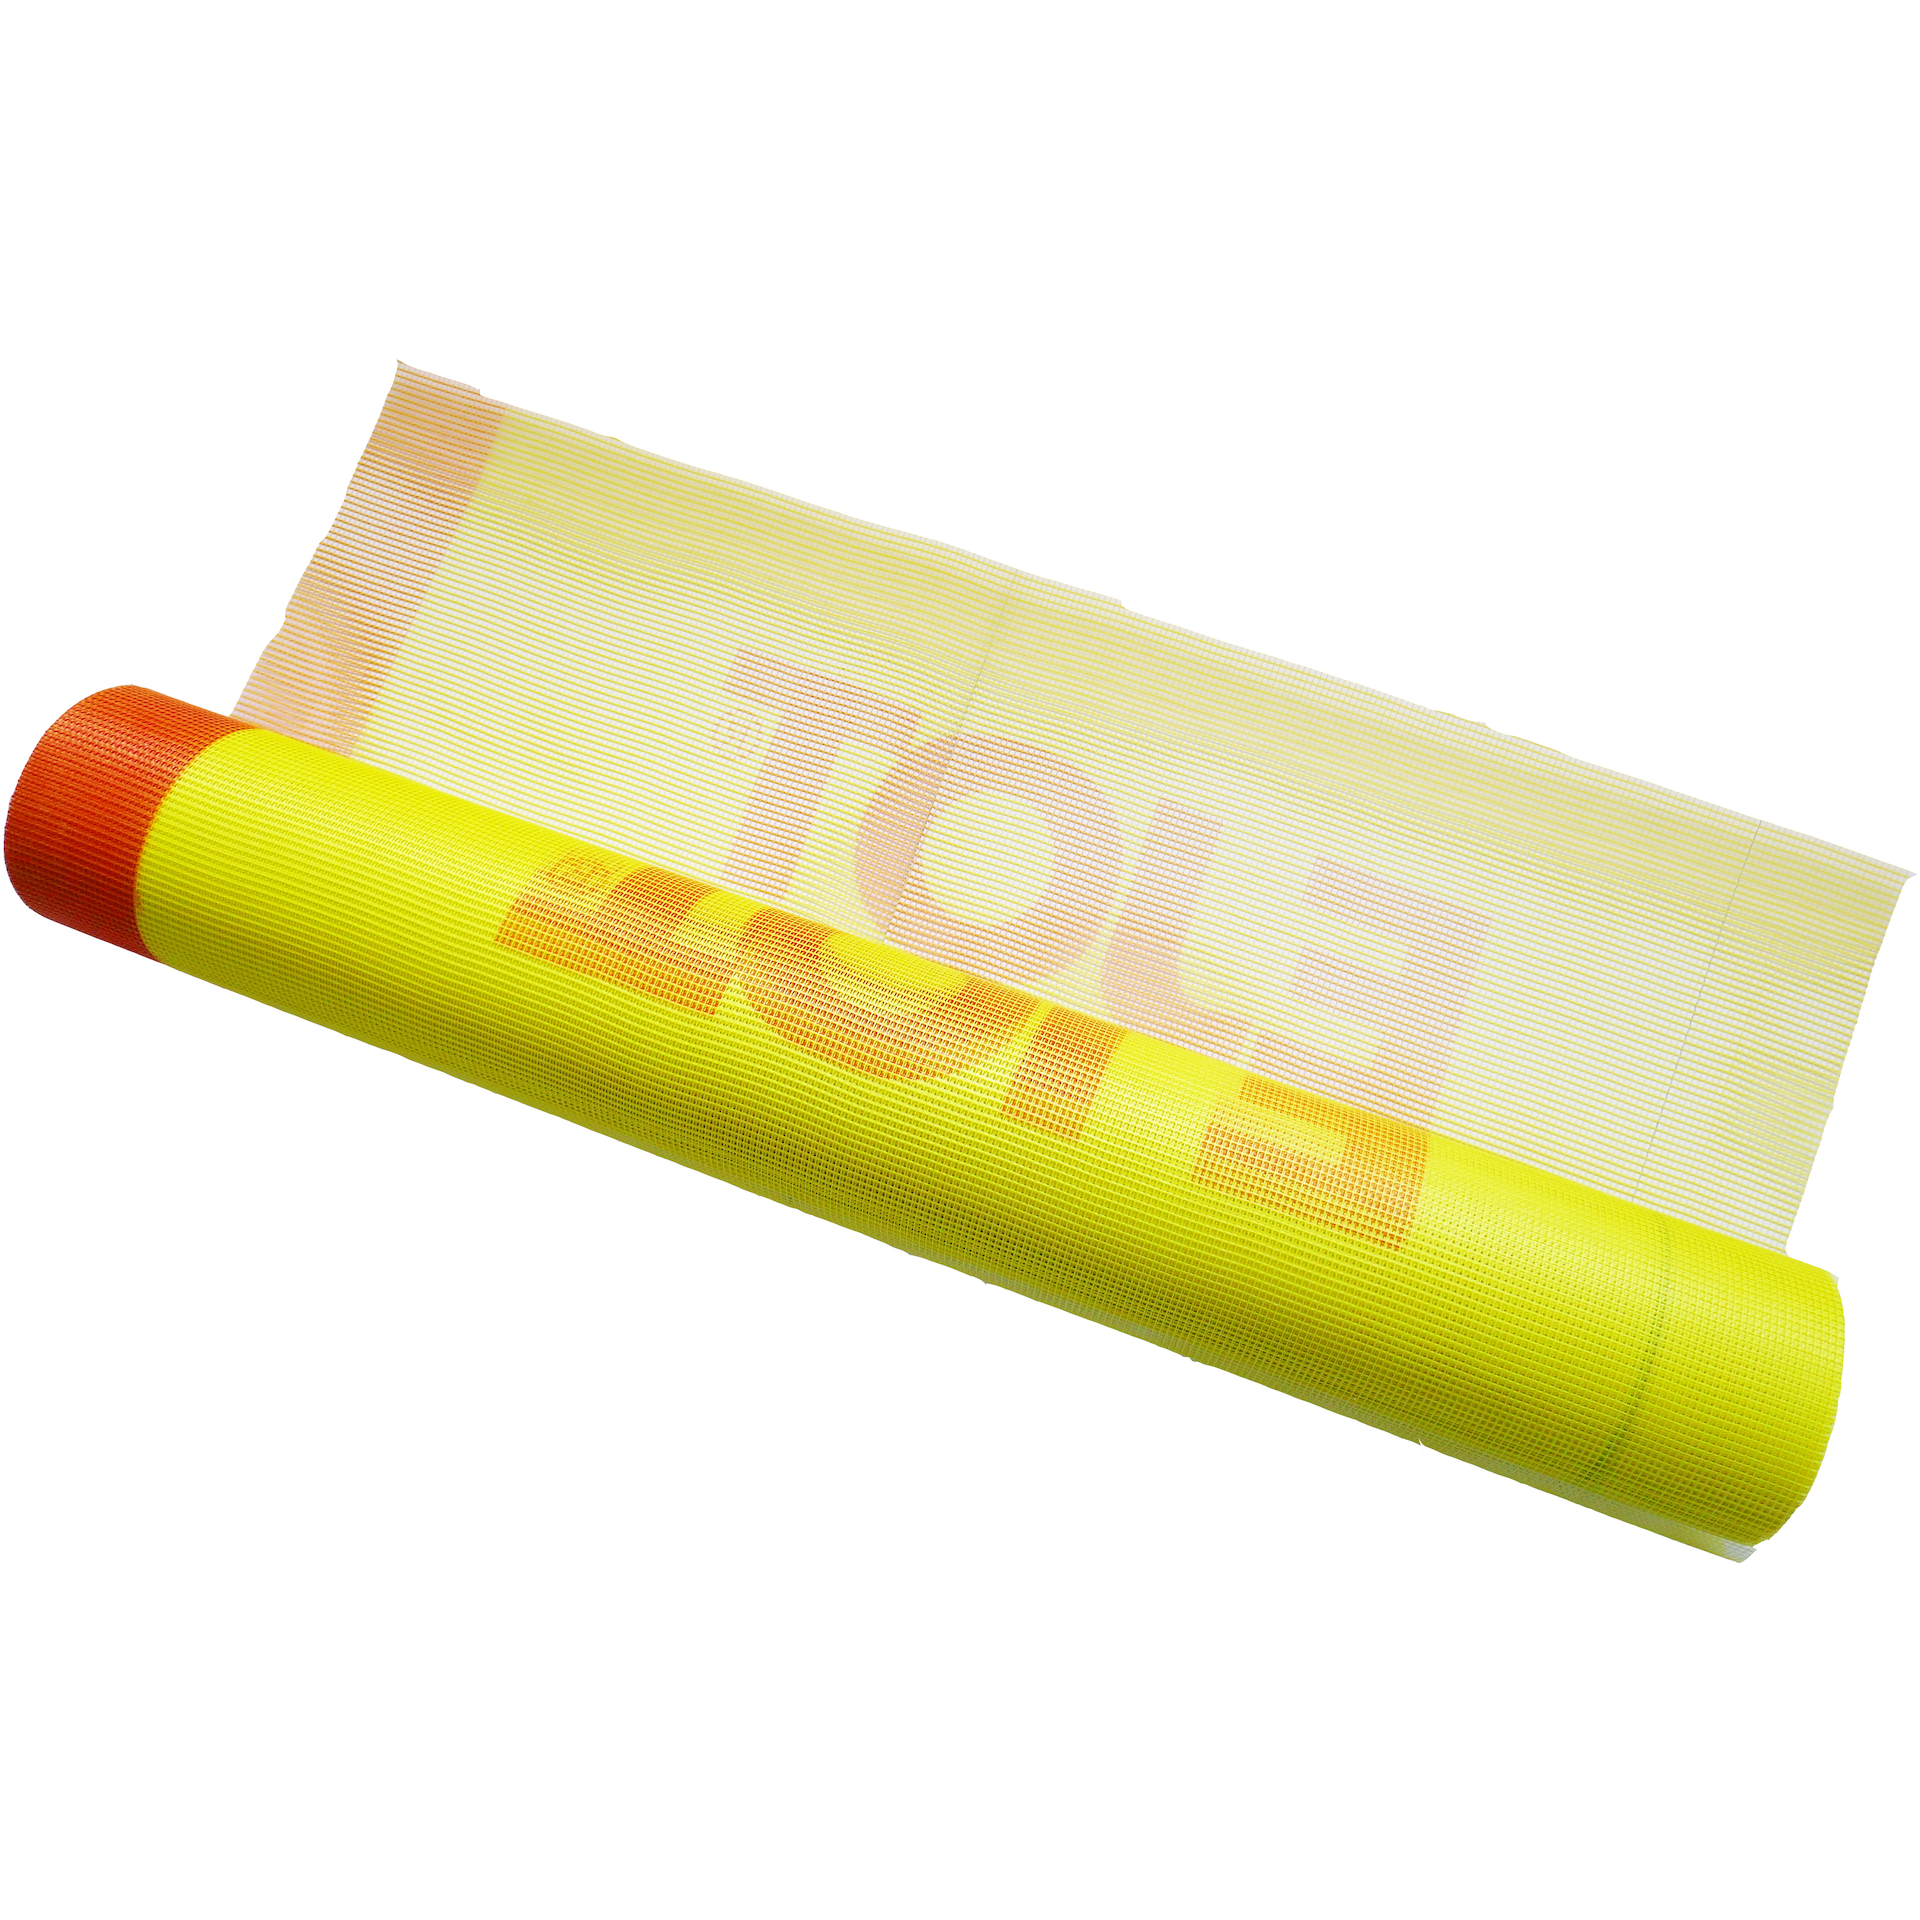 Mira Fibreplaster